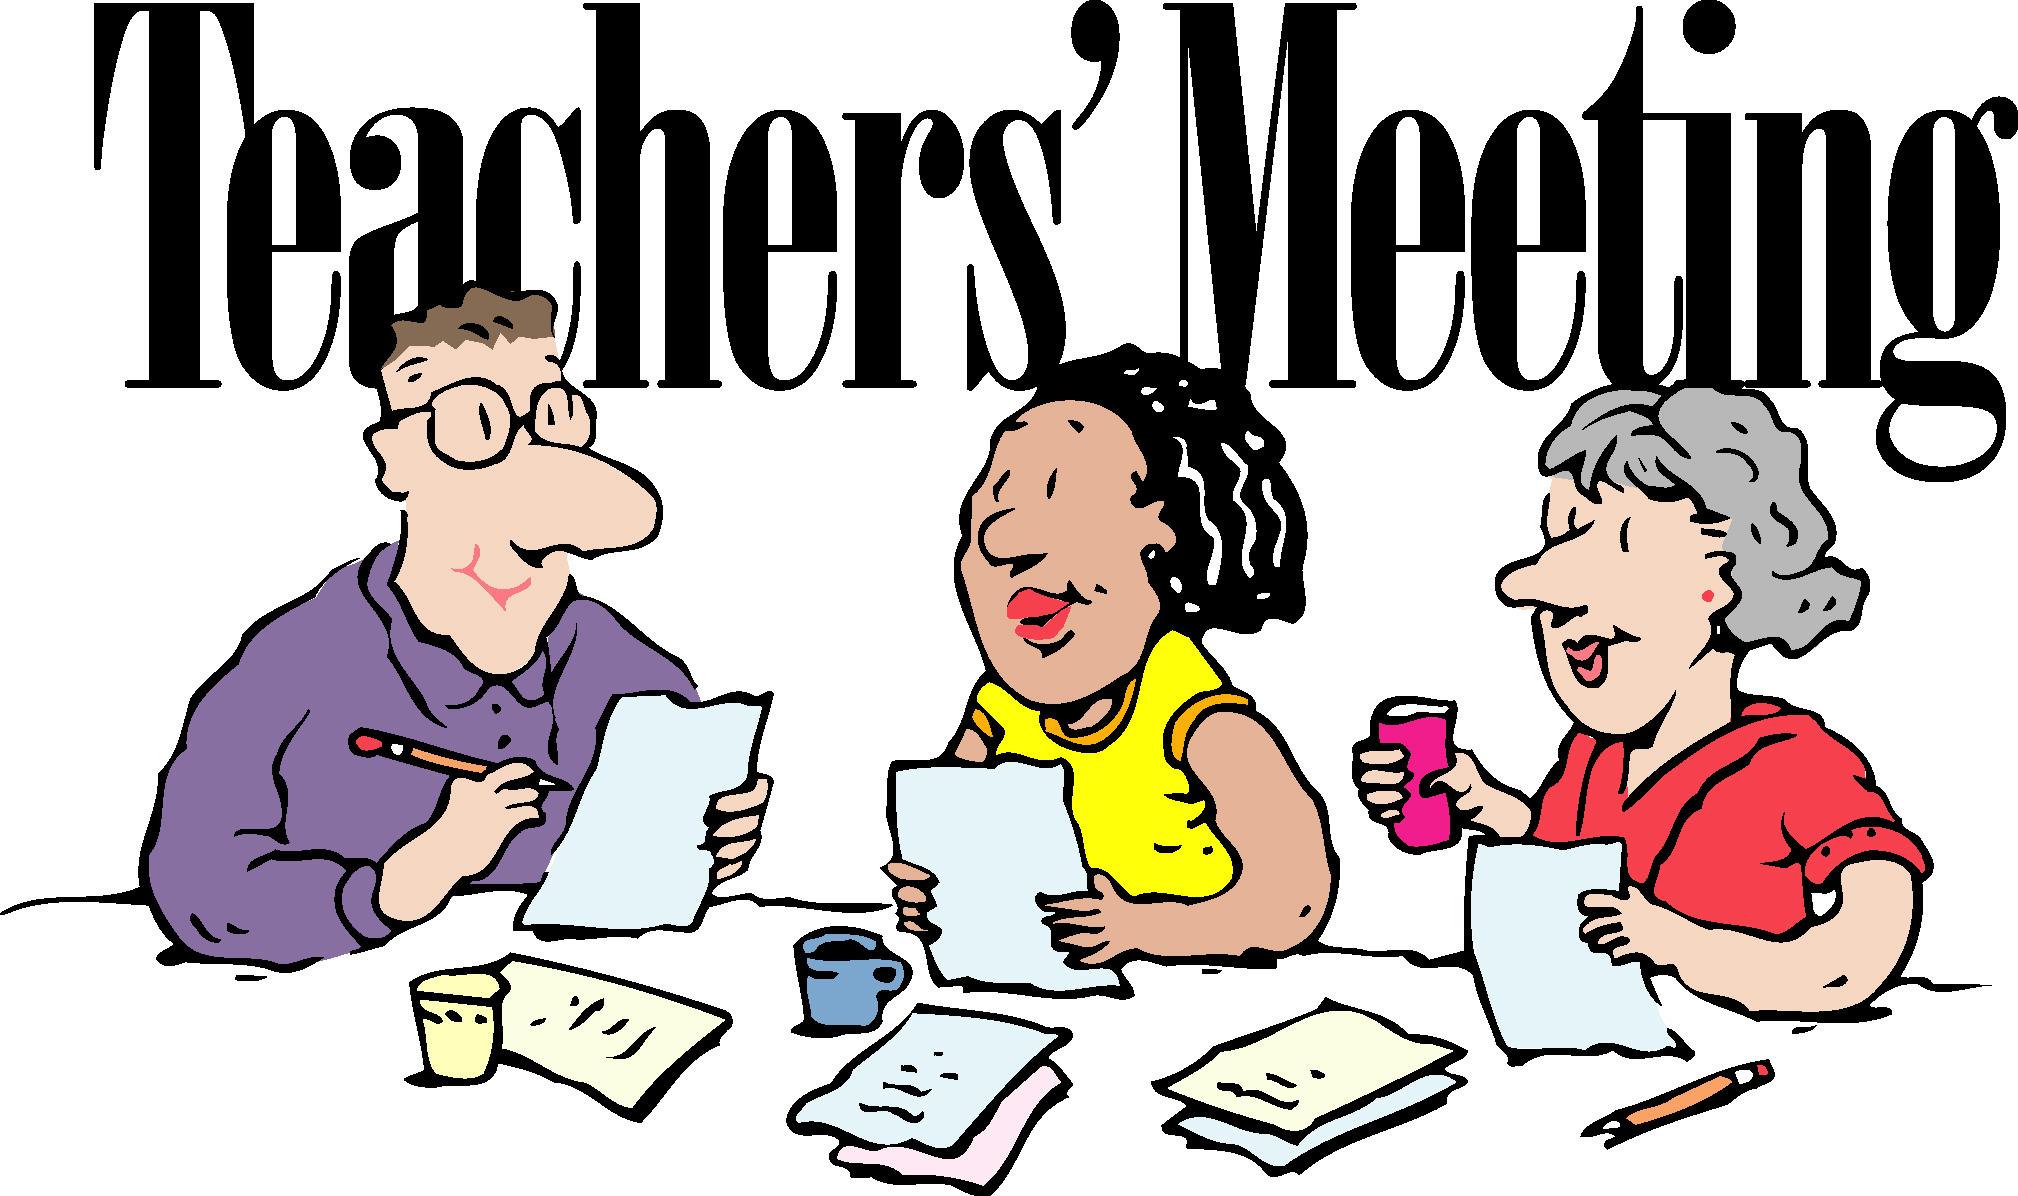 Teachers meeting clipart image transparent download Teachers Meeting Clipart | Free download best Teachers ... image transparent download